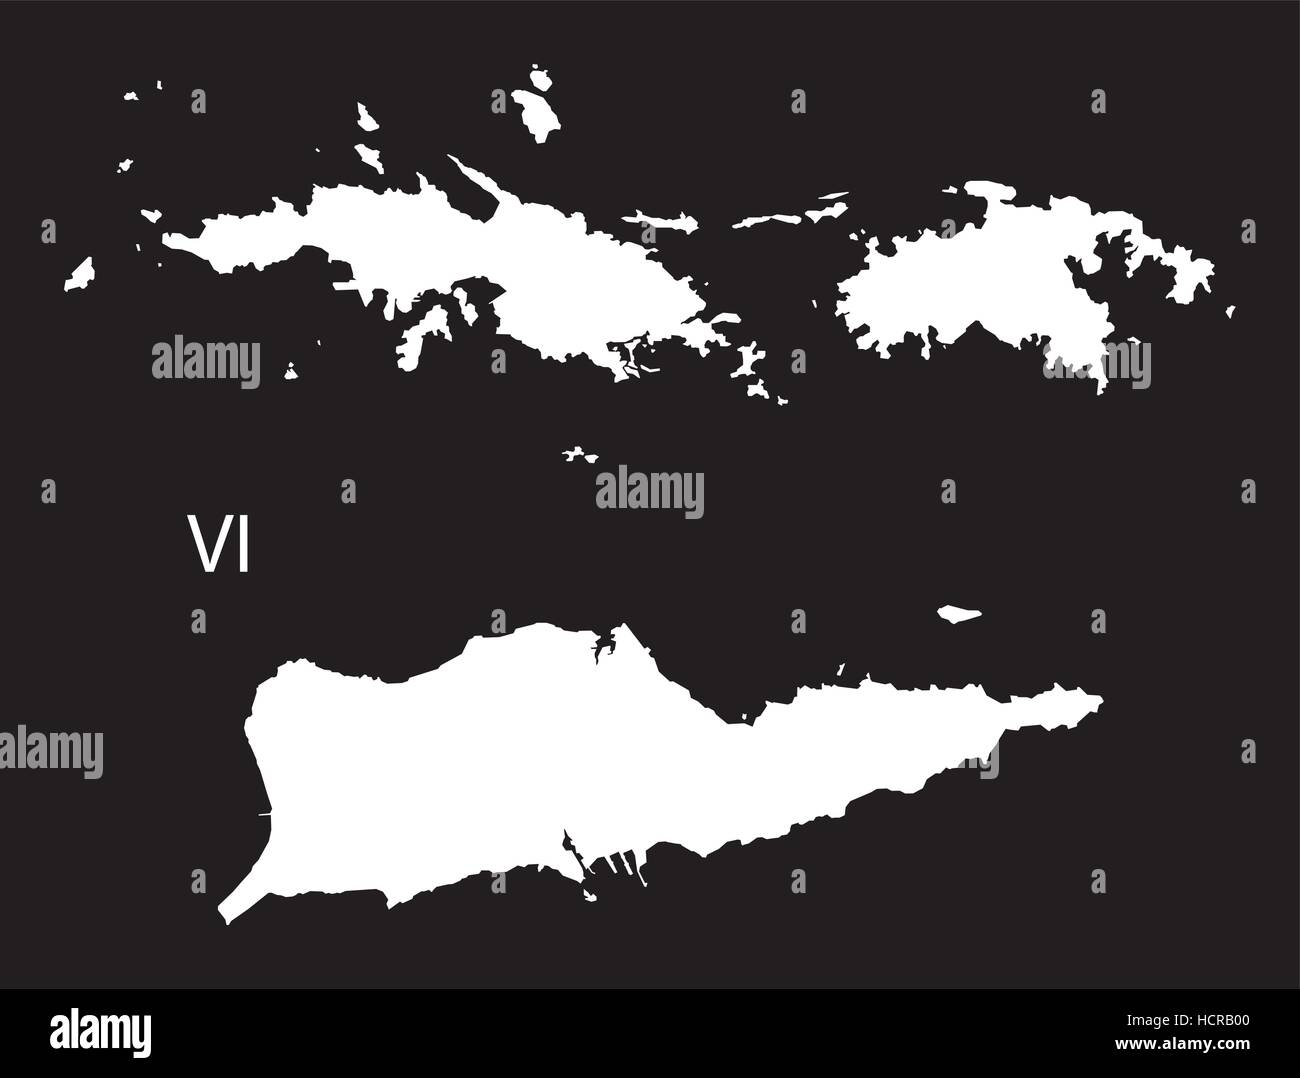 US Virgin Islands Map black and white illustration Stock Vector Art ...